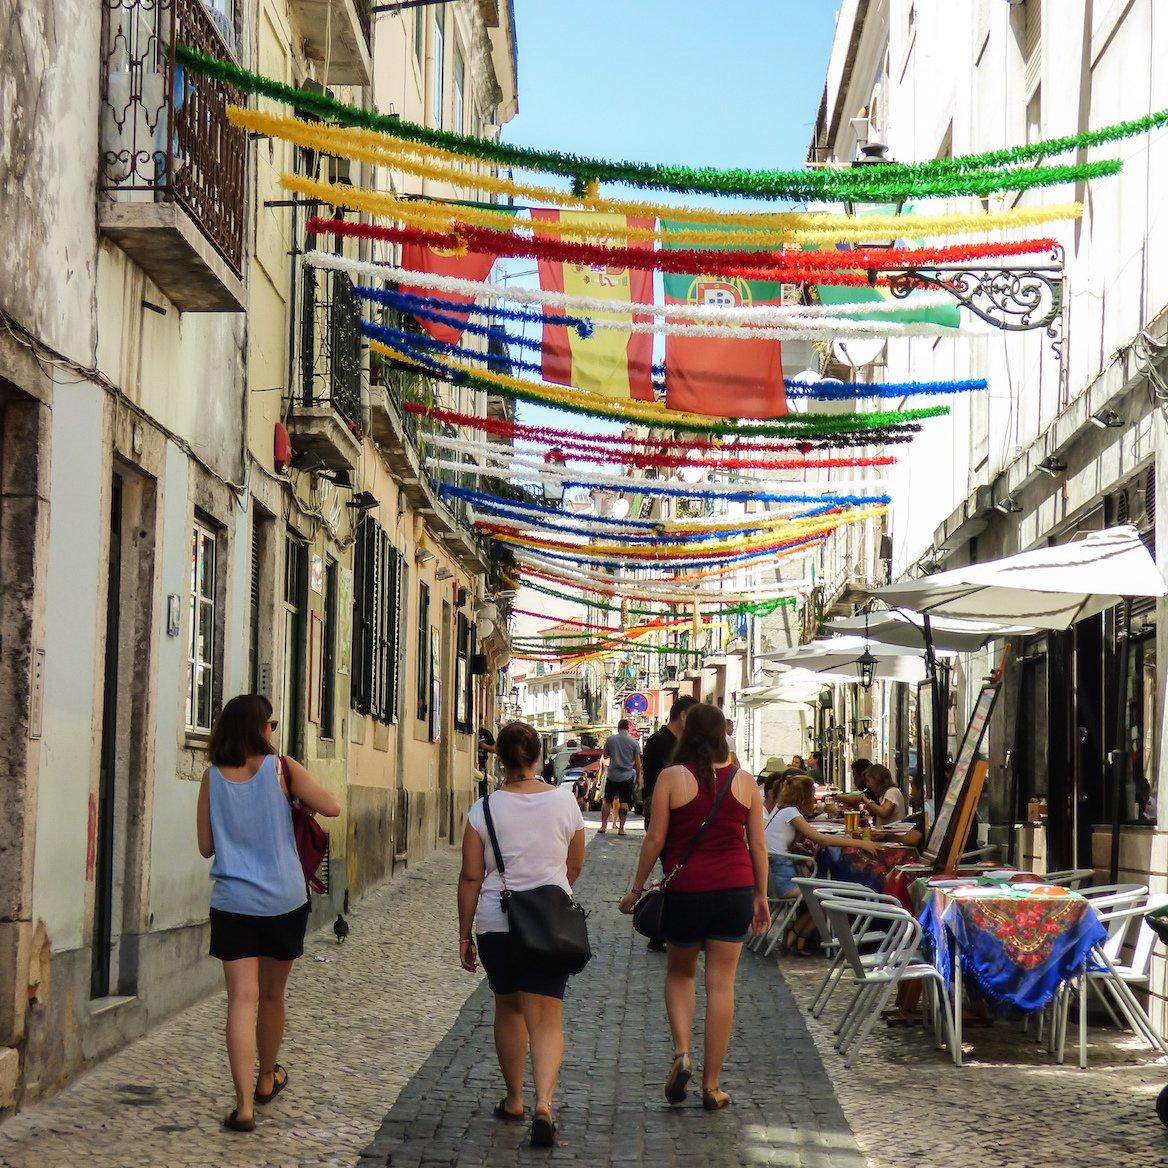 bairro-alto-rue-lisbonne-portugal